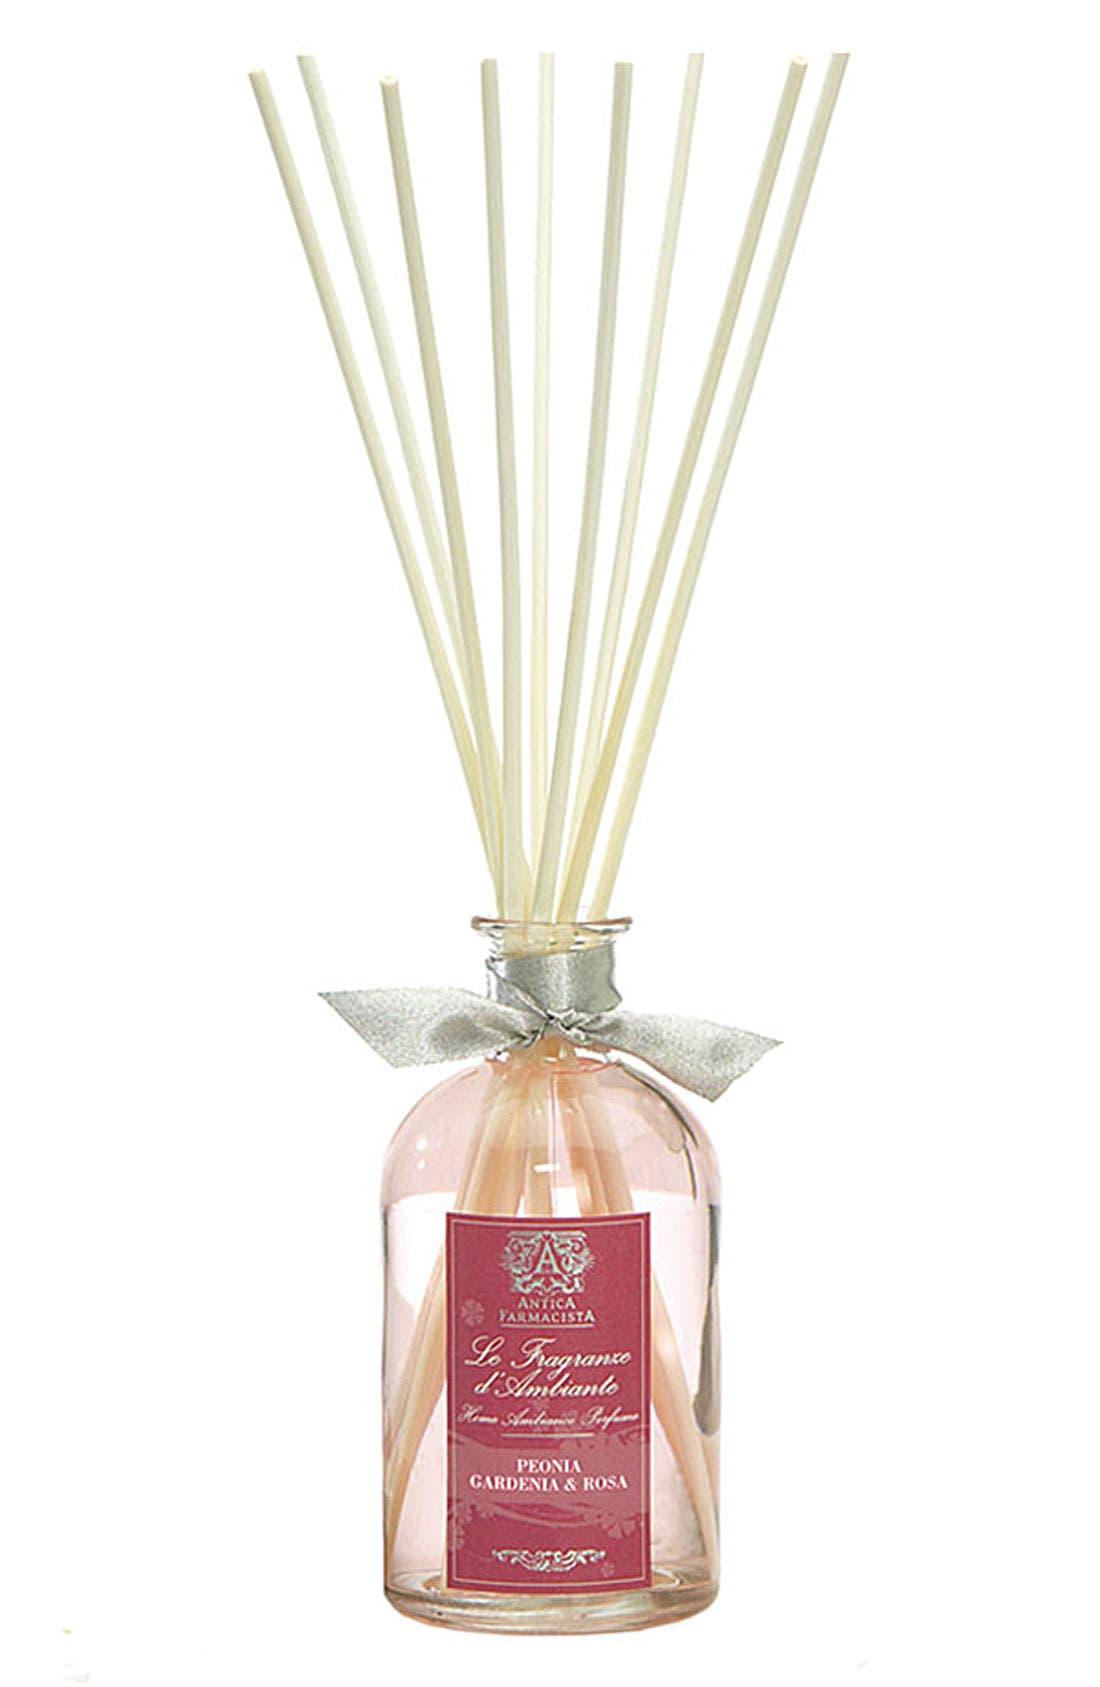 ANTICA FARMACISTA 'Peonia Gardenia & Rosa' Home Ambiance